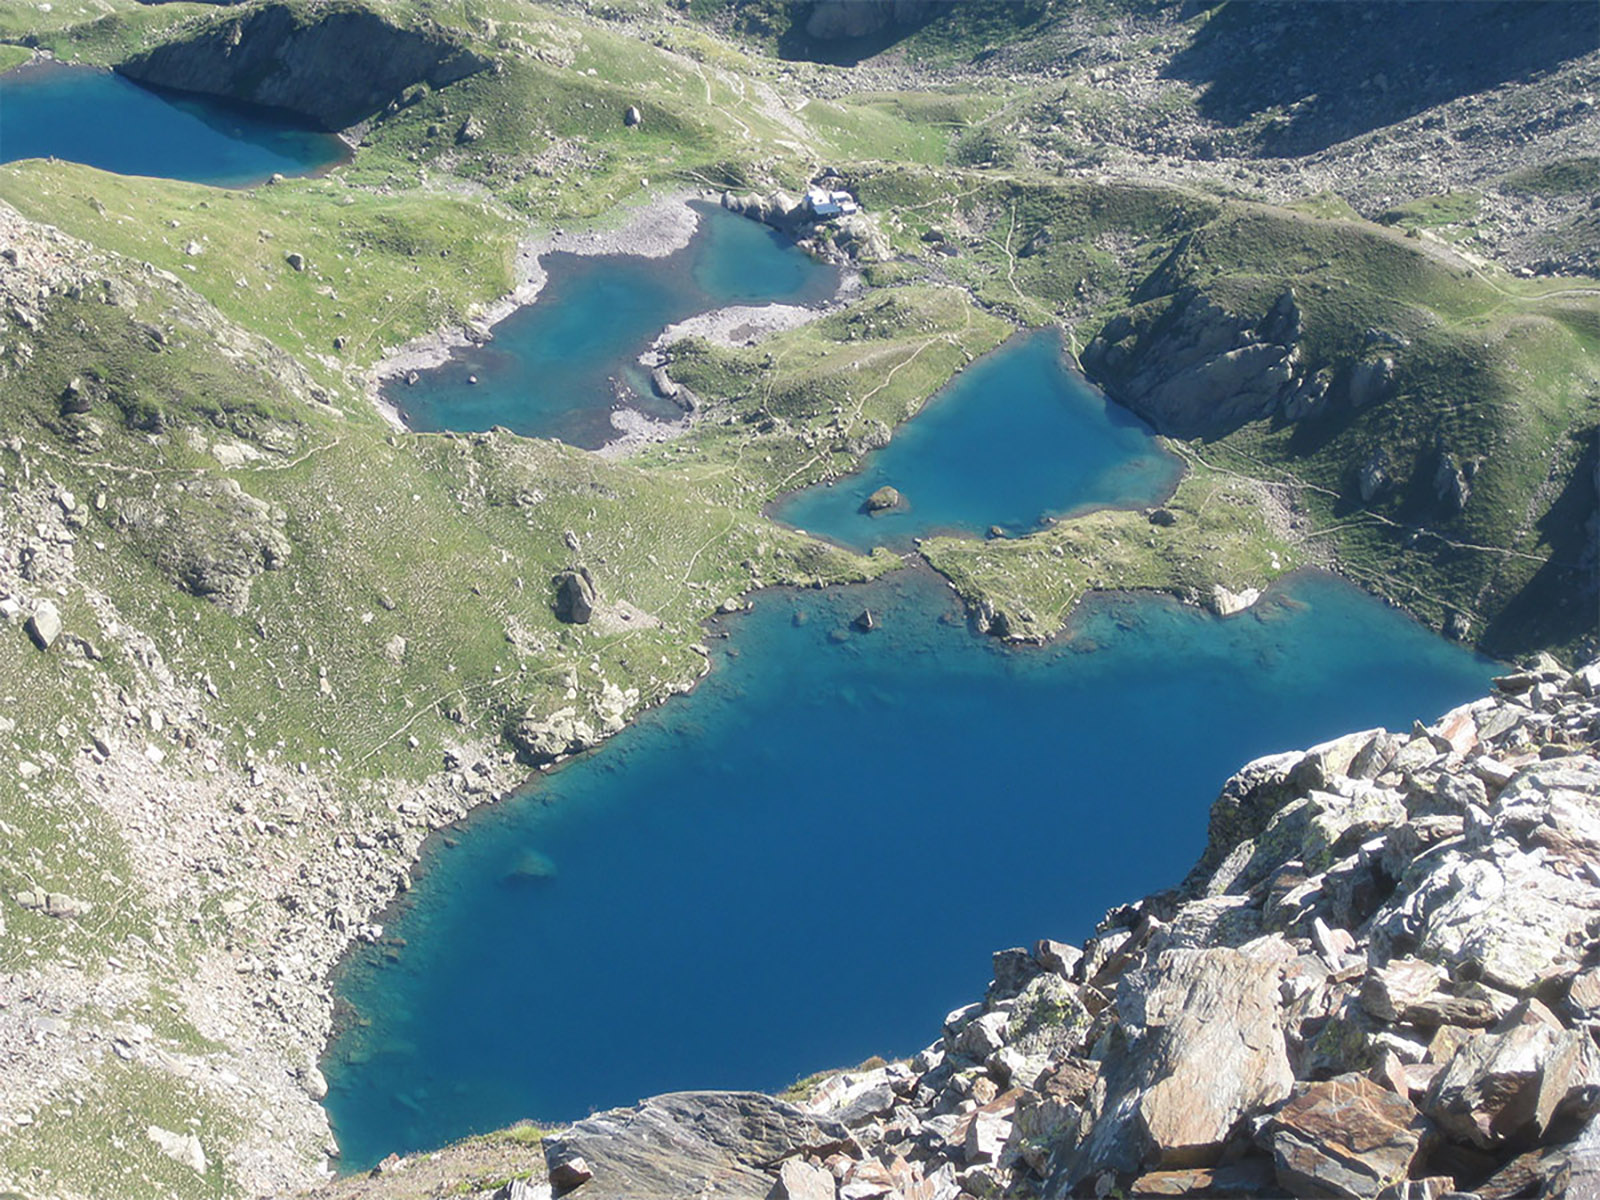 lagos salvaguardia